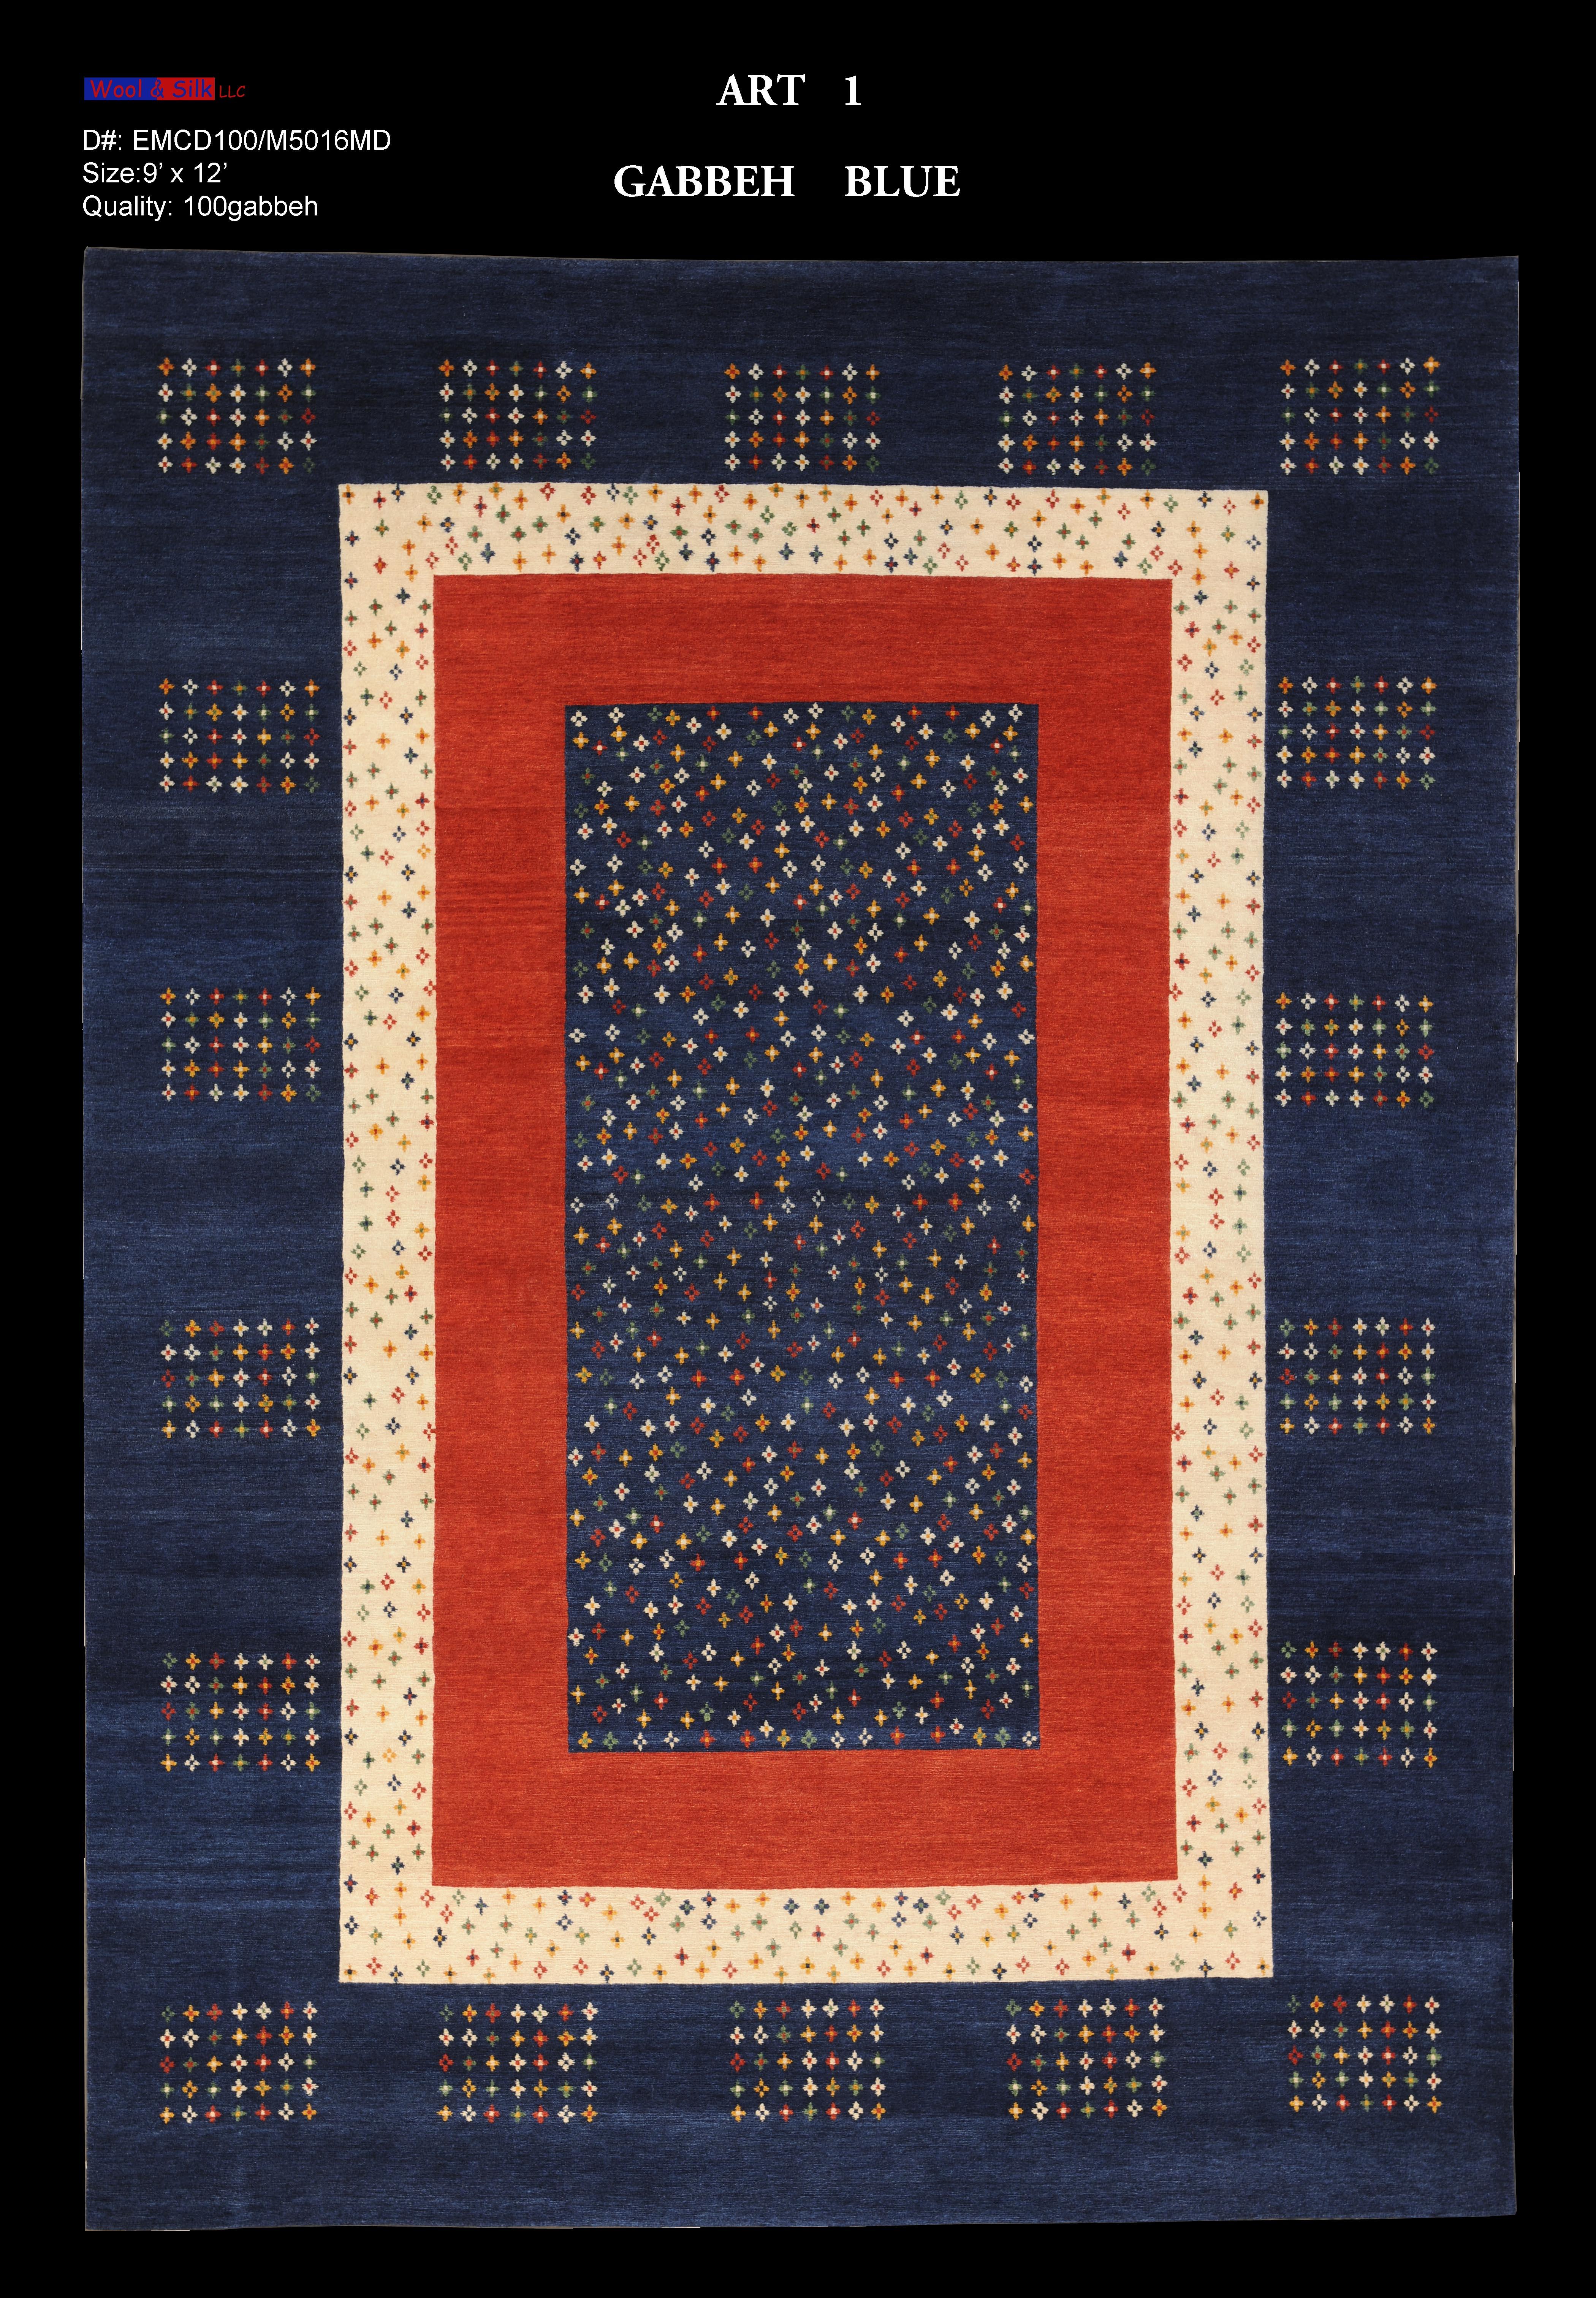 Gabbeh-Blue(EMCD100-M5016) 9'x12'